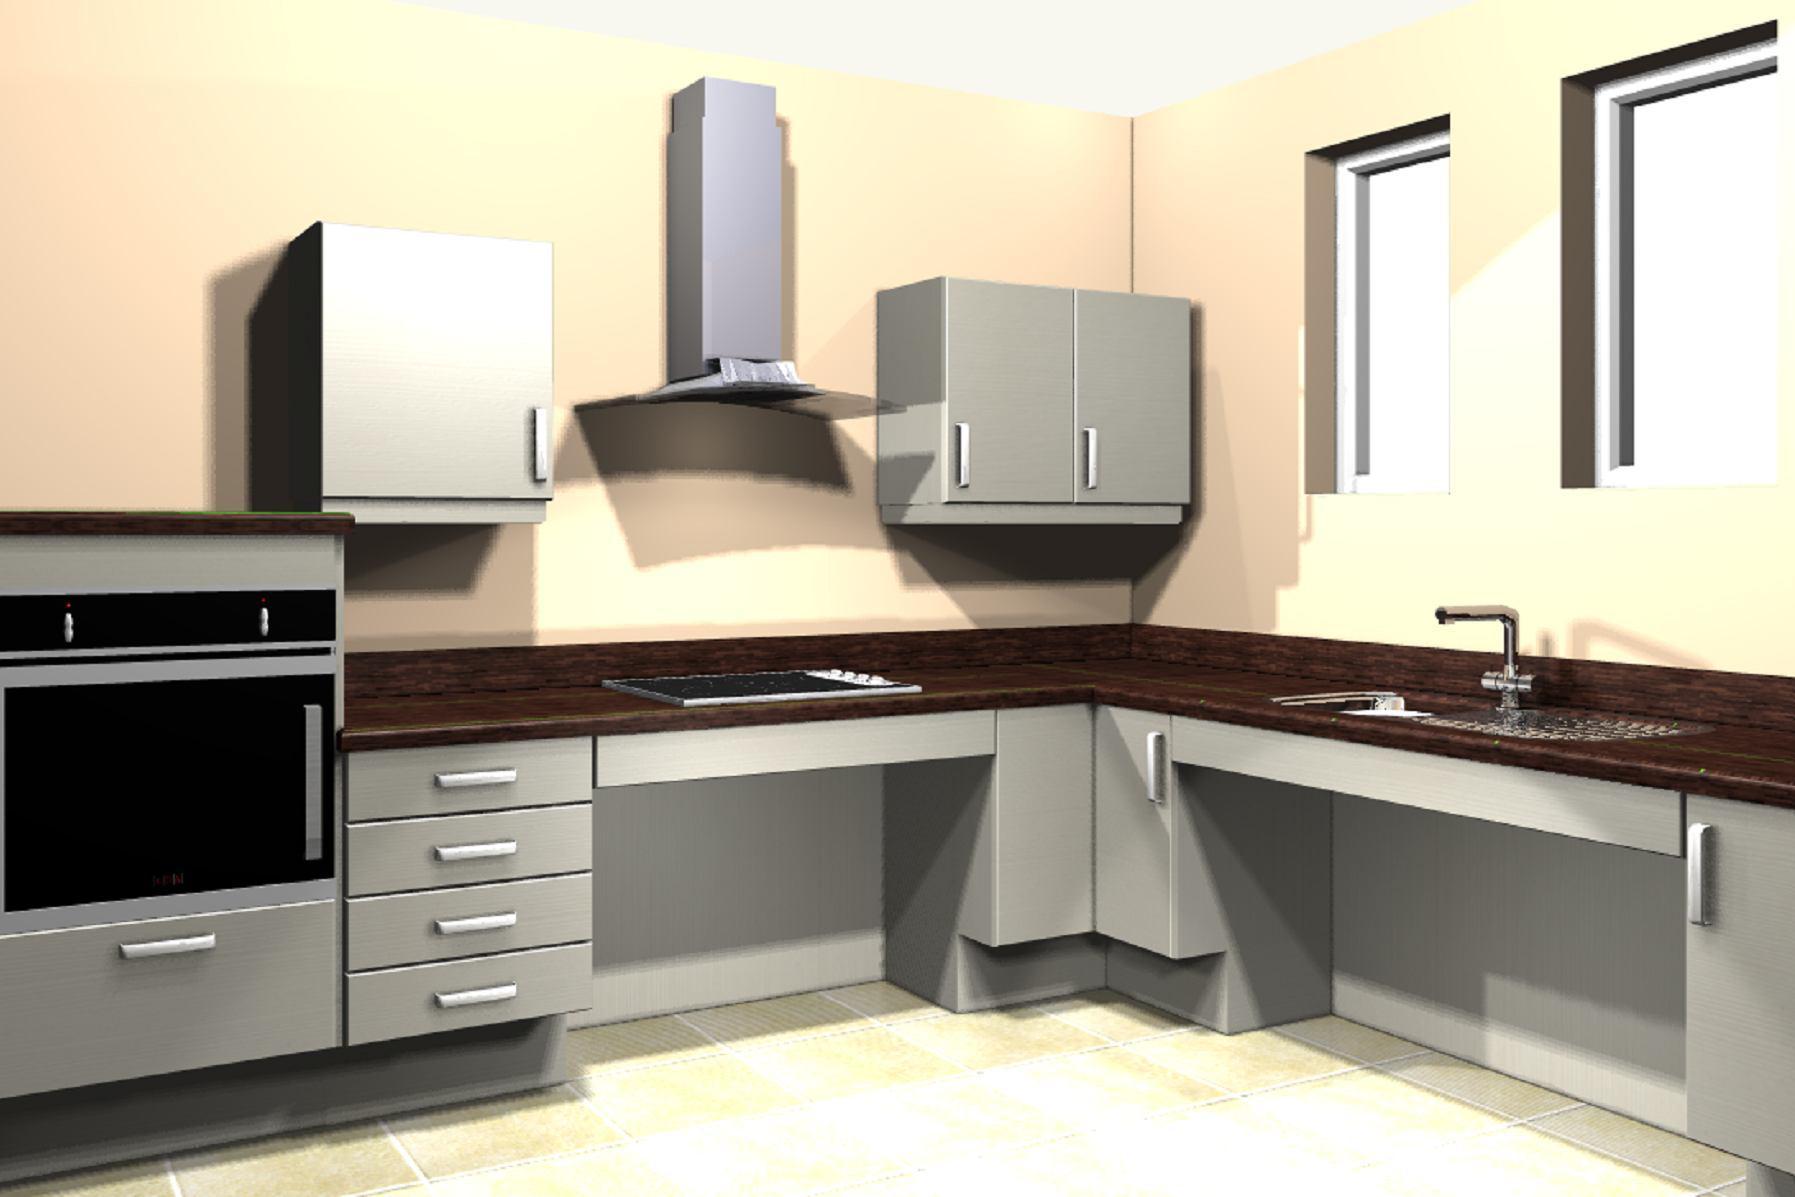 kitchen design for disabled. accessible kitchen designthe disabled